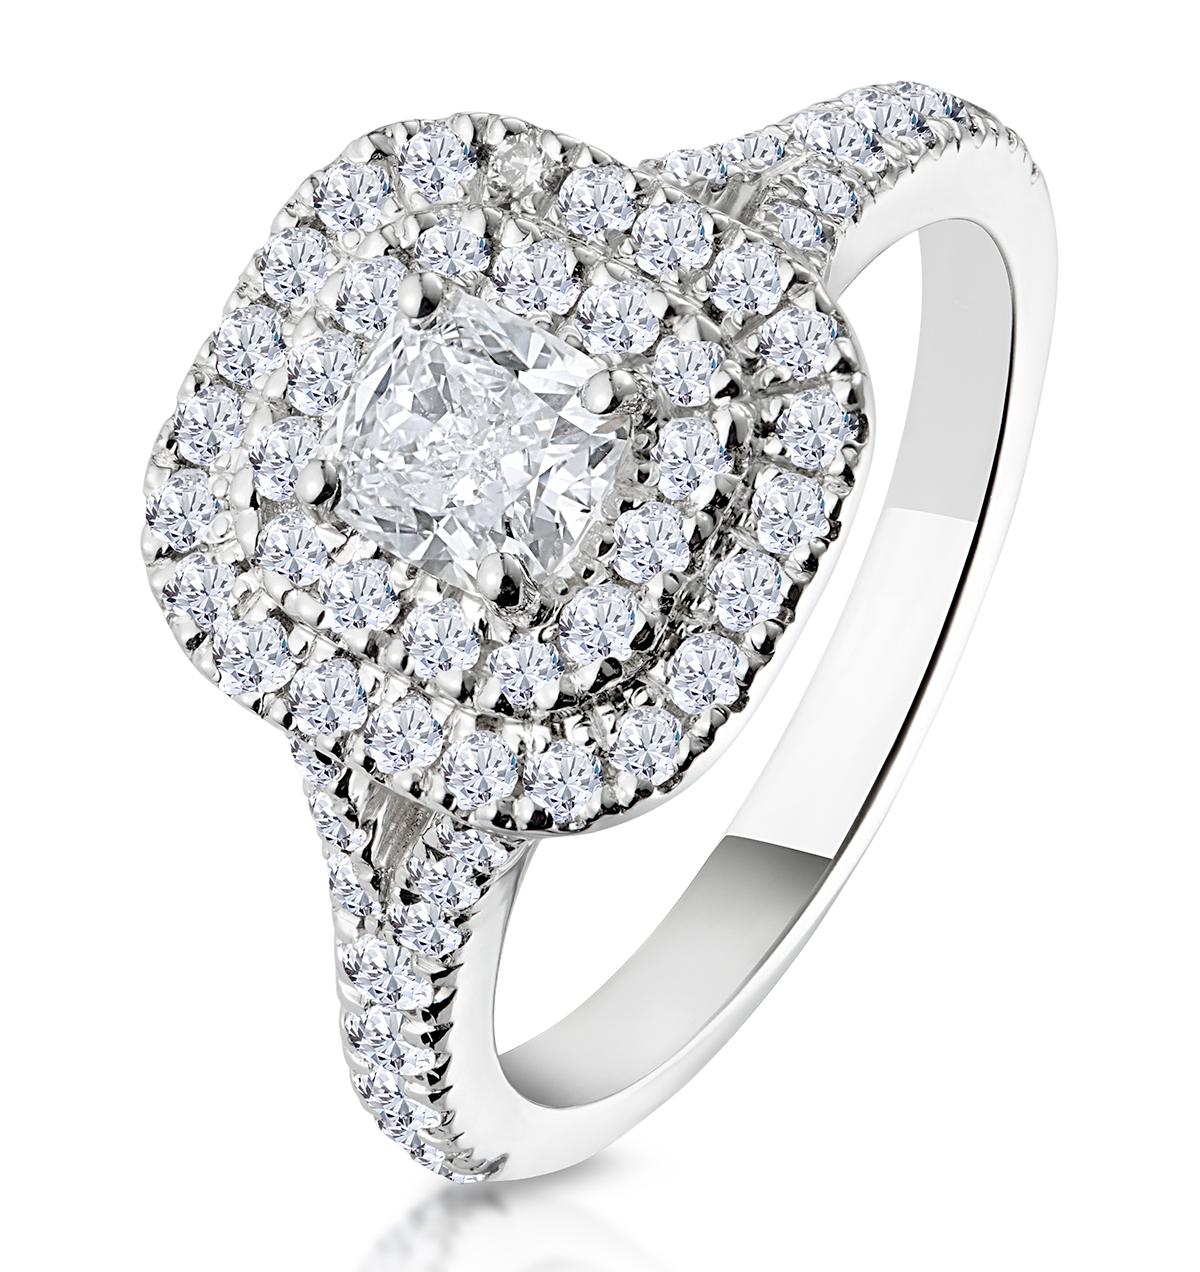 Anastasia GIA Diamond Halo Engagement Ring in Platinum 1.30ct G/SI2 - image 1